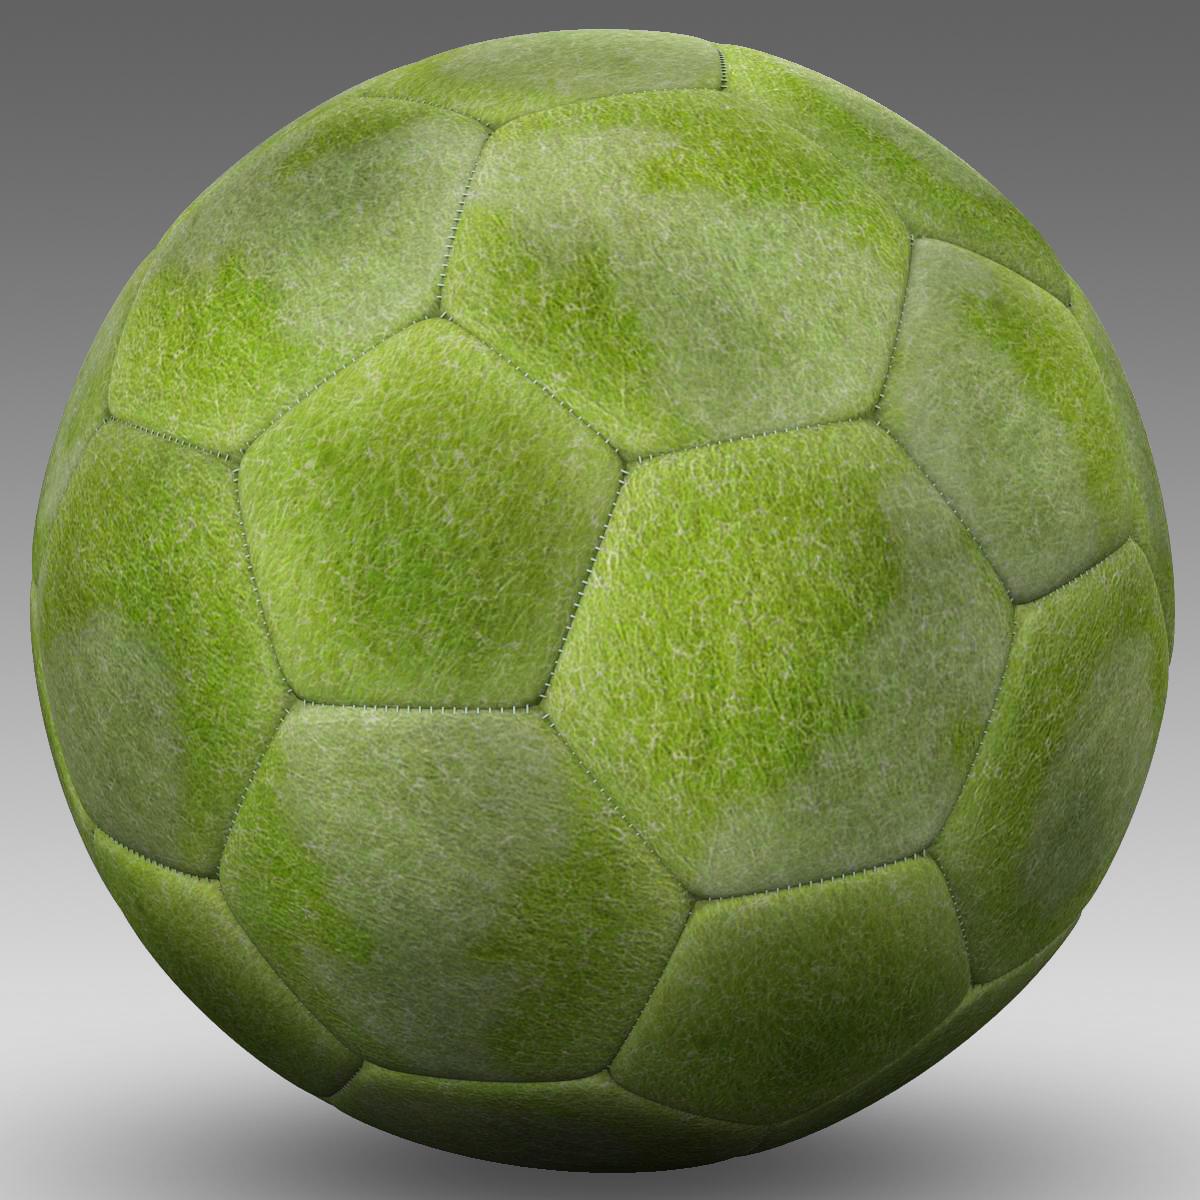 soccerball дотроо 3d загвар 3ds max fbx c4d м mb obj 205143